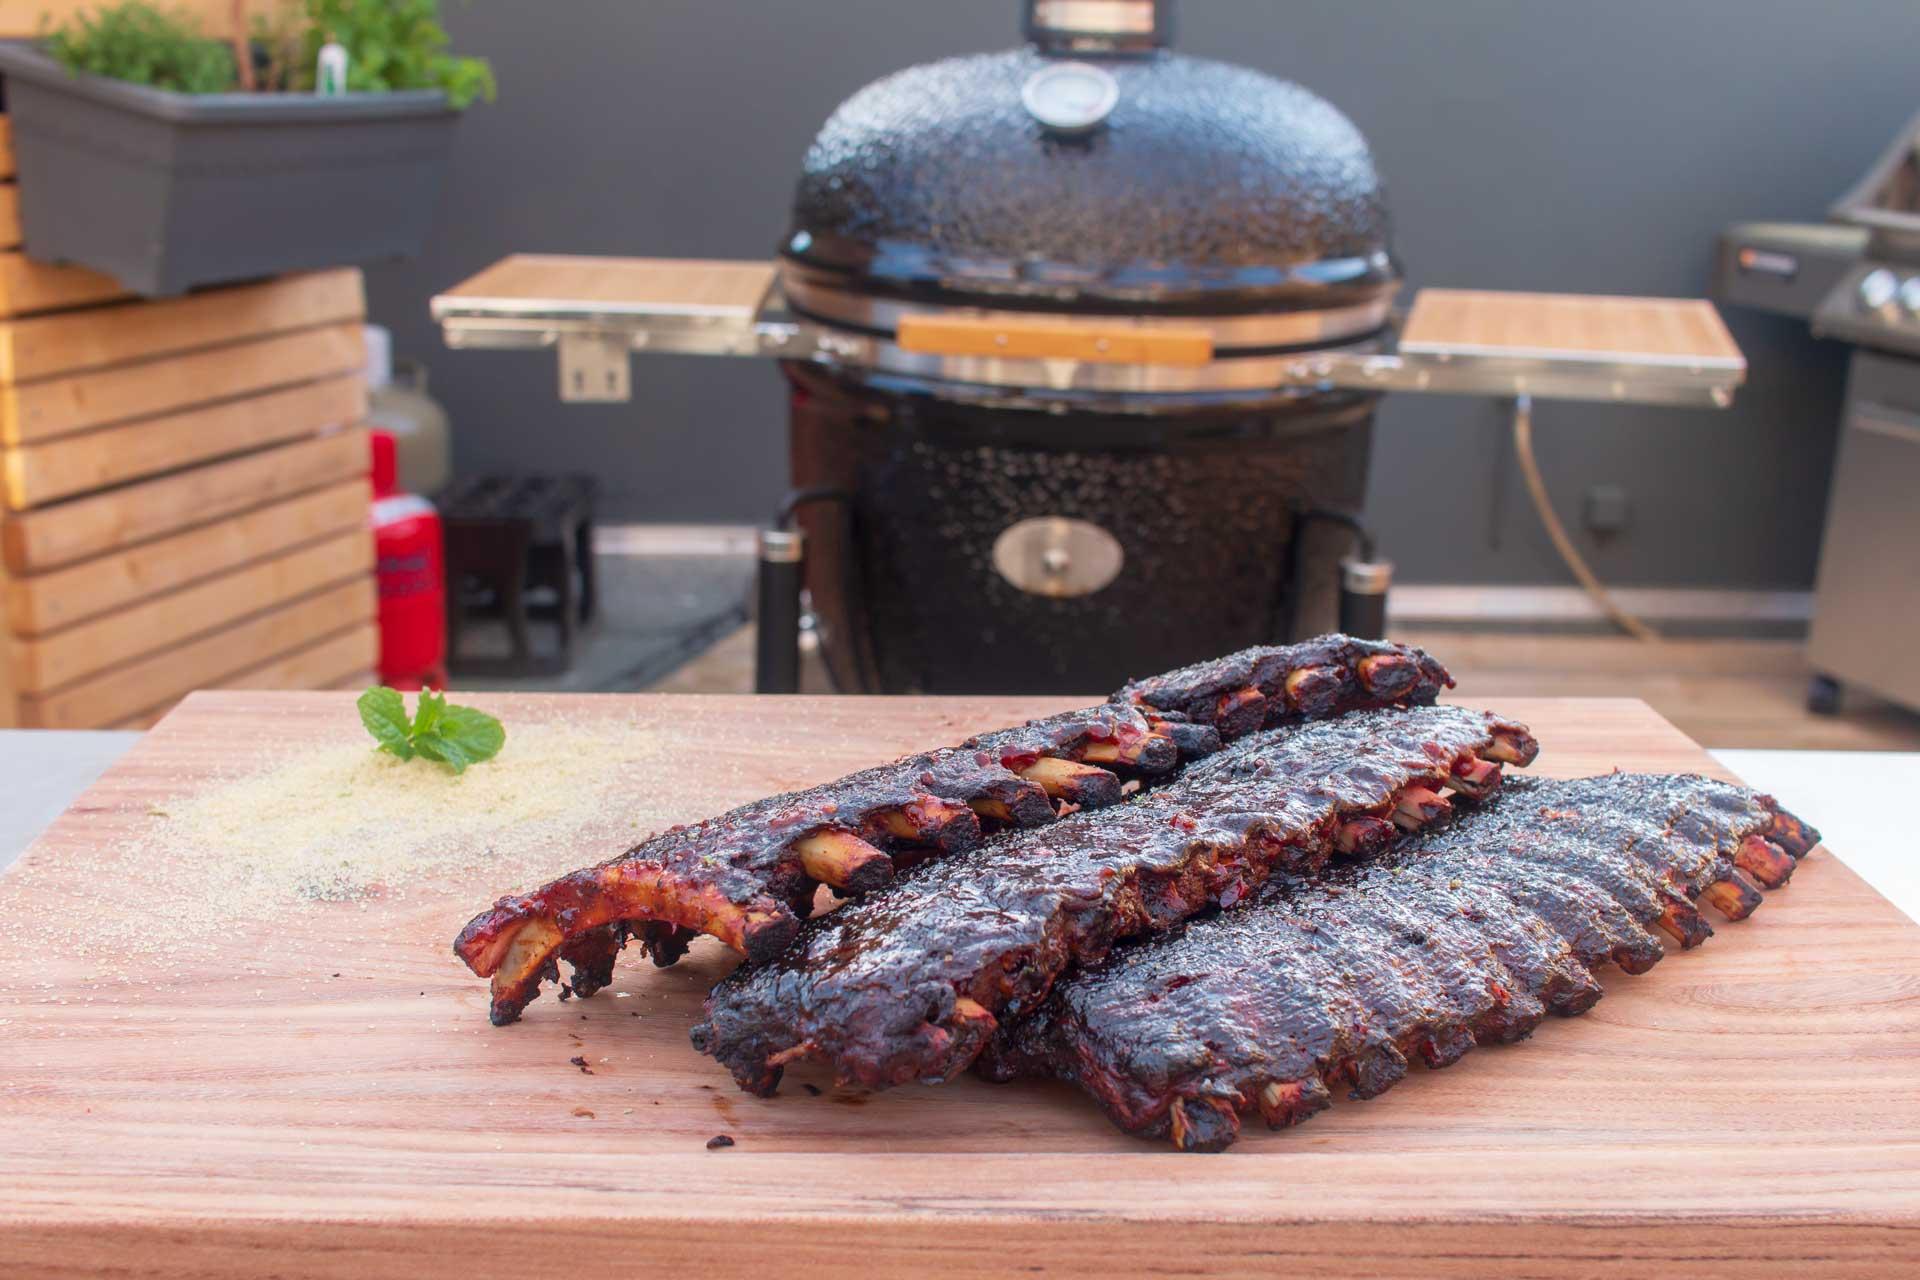 Sizzle Brothers Spareribs Vom Gasgrill : 2 1 1 ribs sriracha hot ribs saftig leckere hot ribs